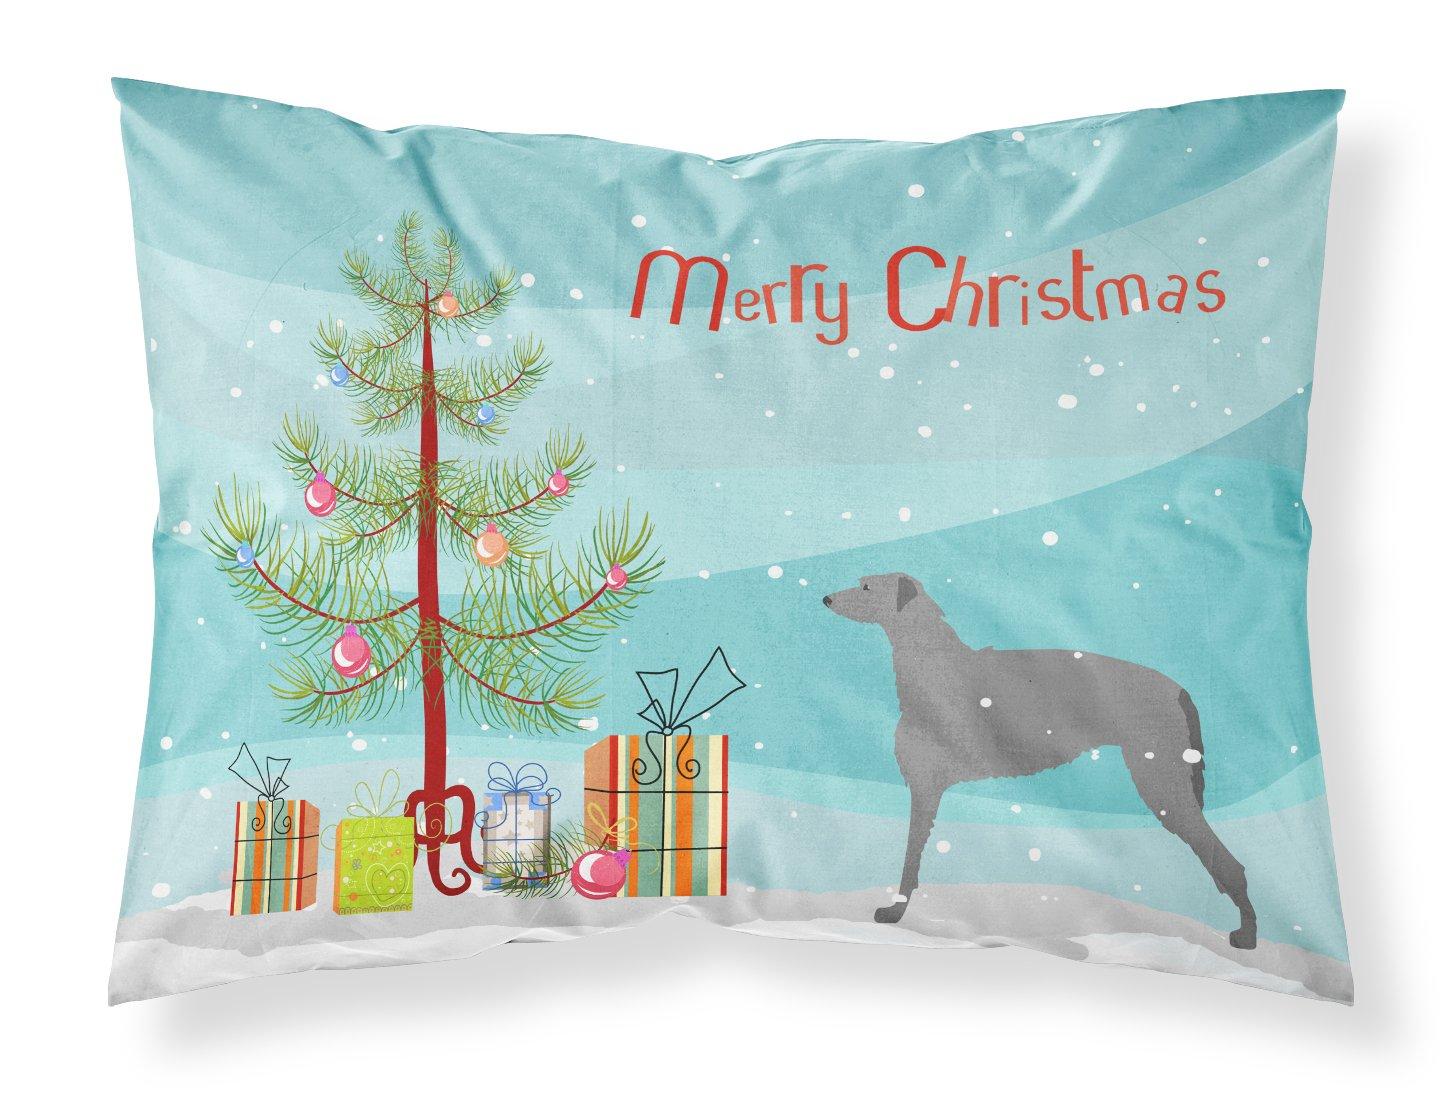 Carolines Treasures Chinese Crested Merry Christmas Tree Fabric Standard Pillowcase BB2961PILLOWCASE,